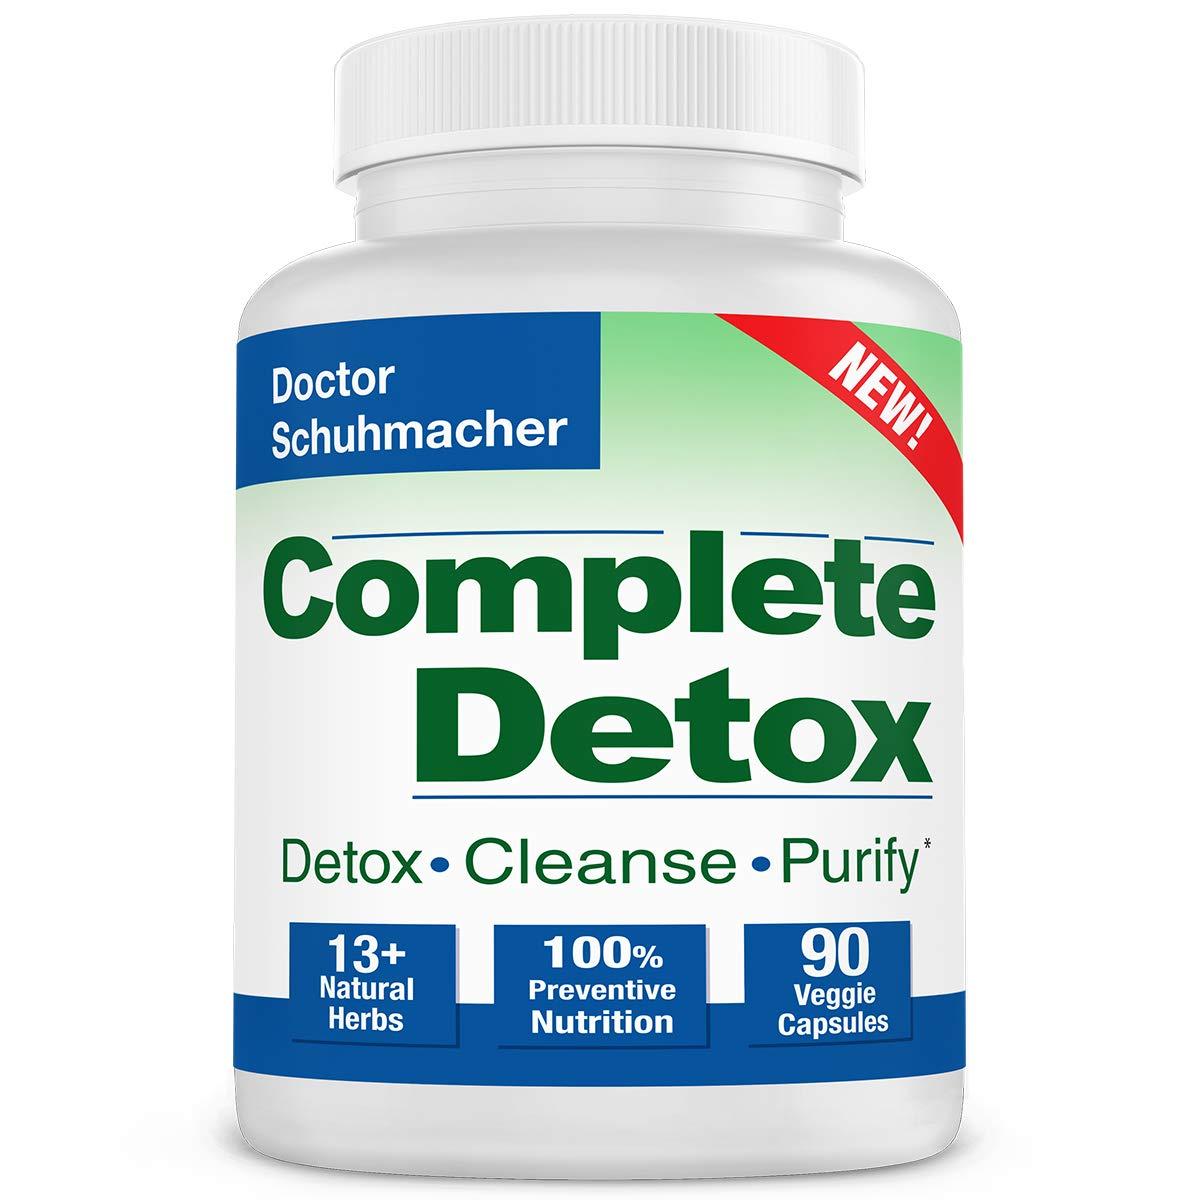 Longevity Complete Detox Formula Scientifically